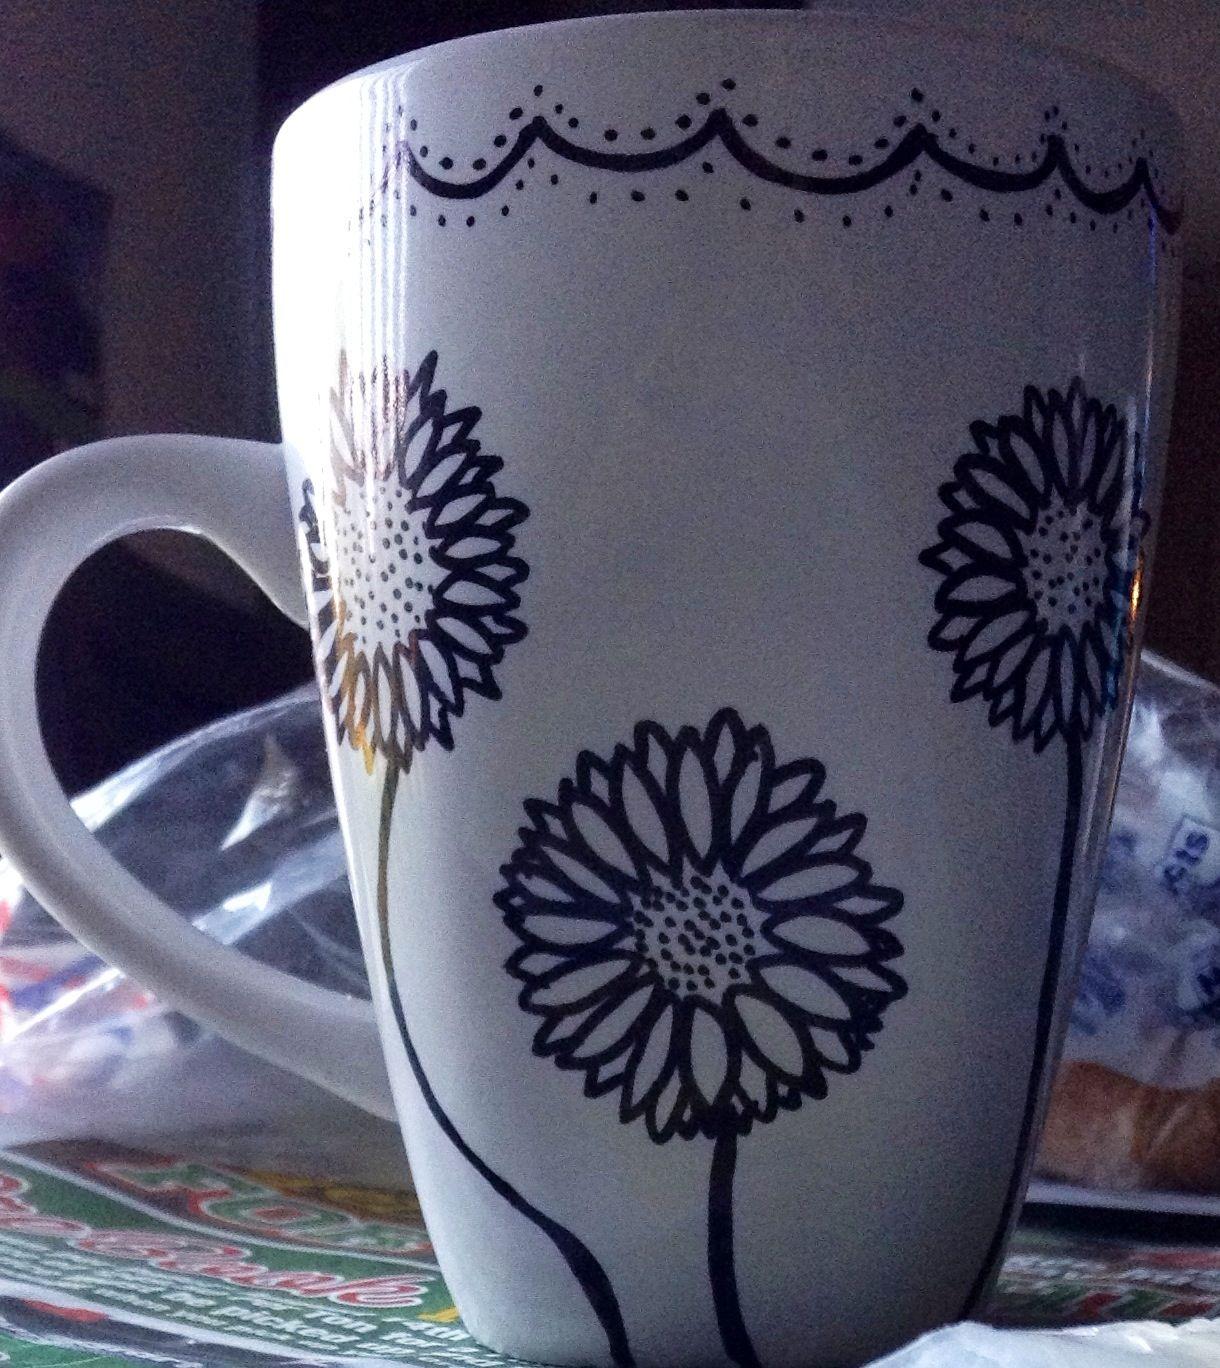 Sharpie Mug Design With Flowers Diy Sharpie Mug Designs Diy Sharpie Mug Diy Mugs